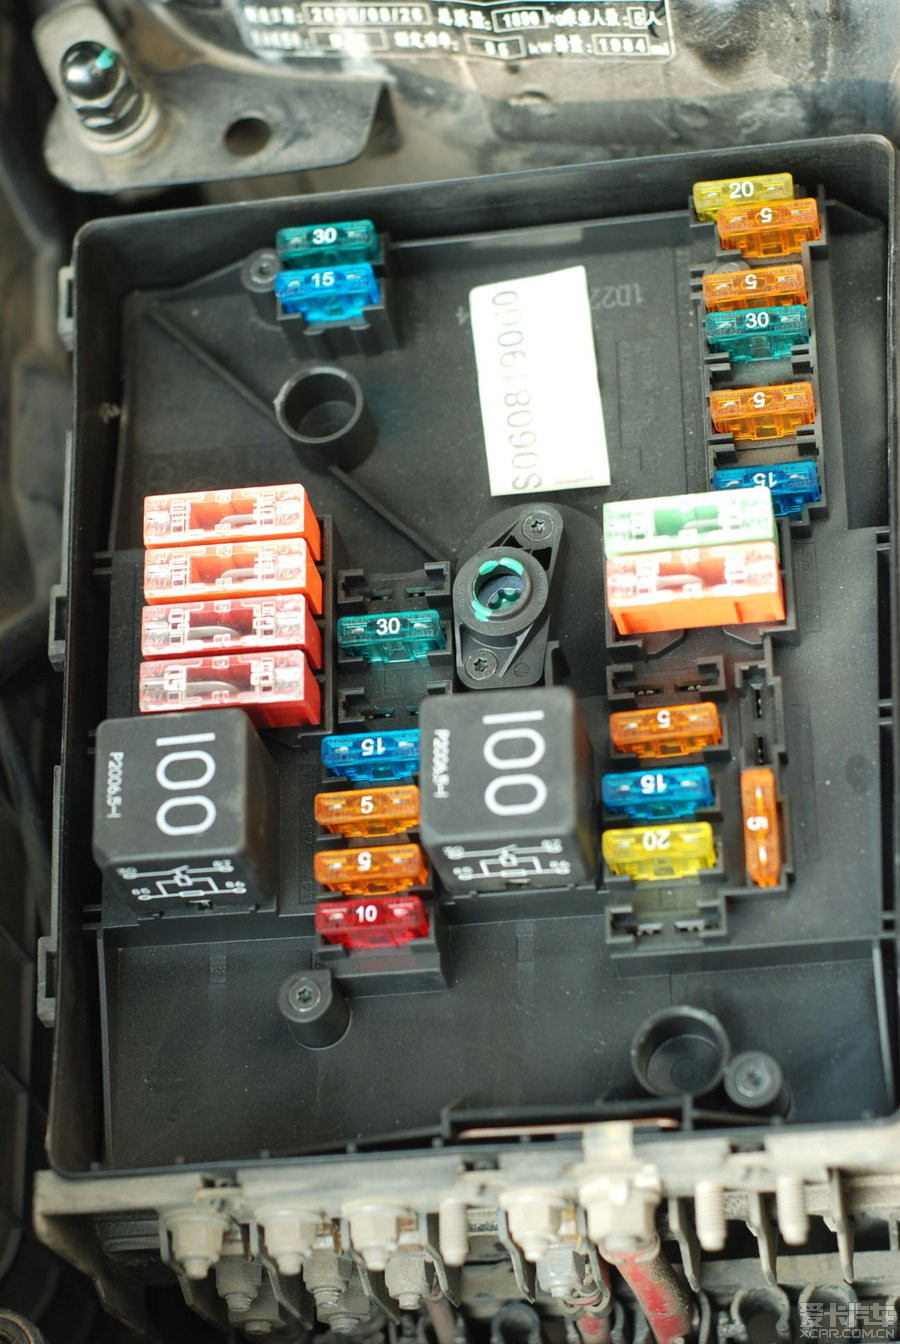 09g速腾 发动机仓 继电器盒 保险丝严重烧毁 求救!